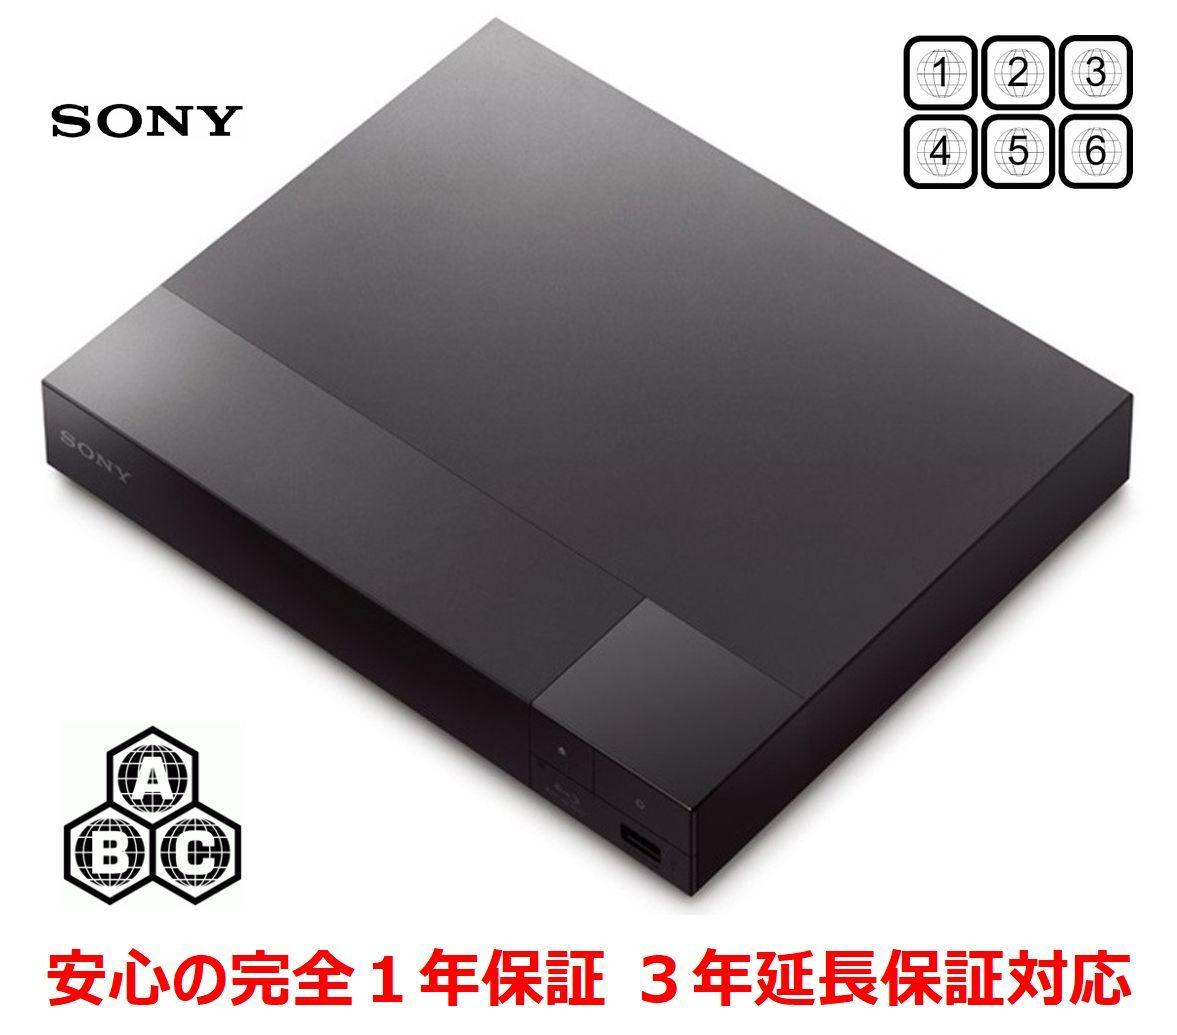 SONY ソニー リージョンフリー ブルーレイ プレーヤー BDP-S6700 PAL/NTSC対応 DVDプレーヤー 日本語バージョン 4Kアップスケール 全世界対応【完全1年保証 3年延長保証対応】【海 外 仕 様】